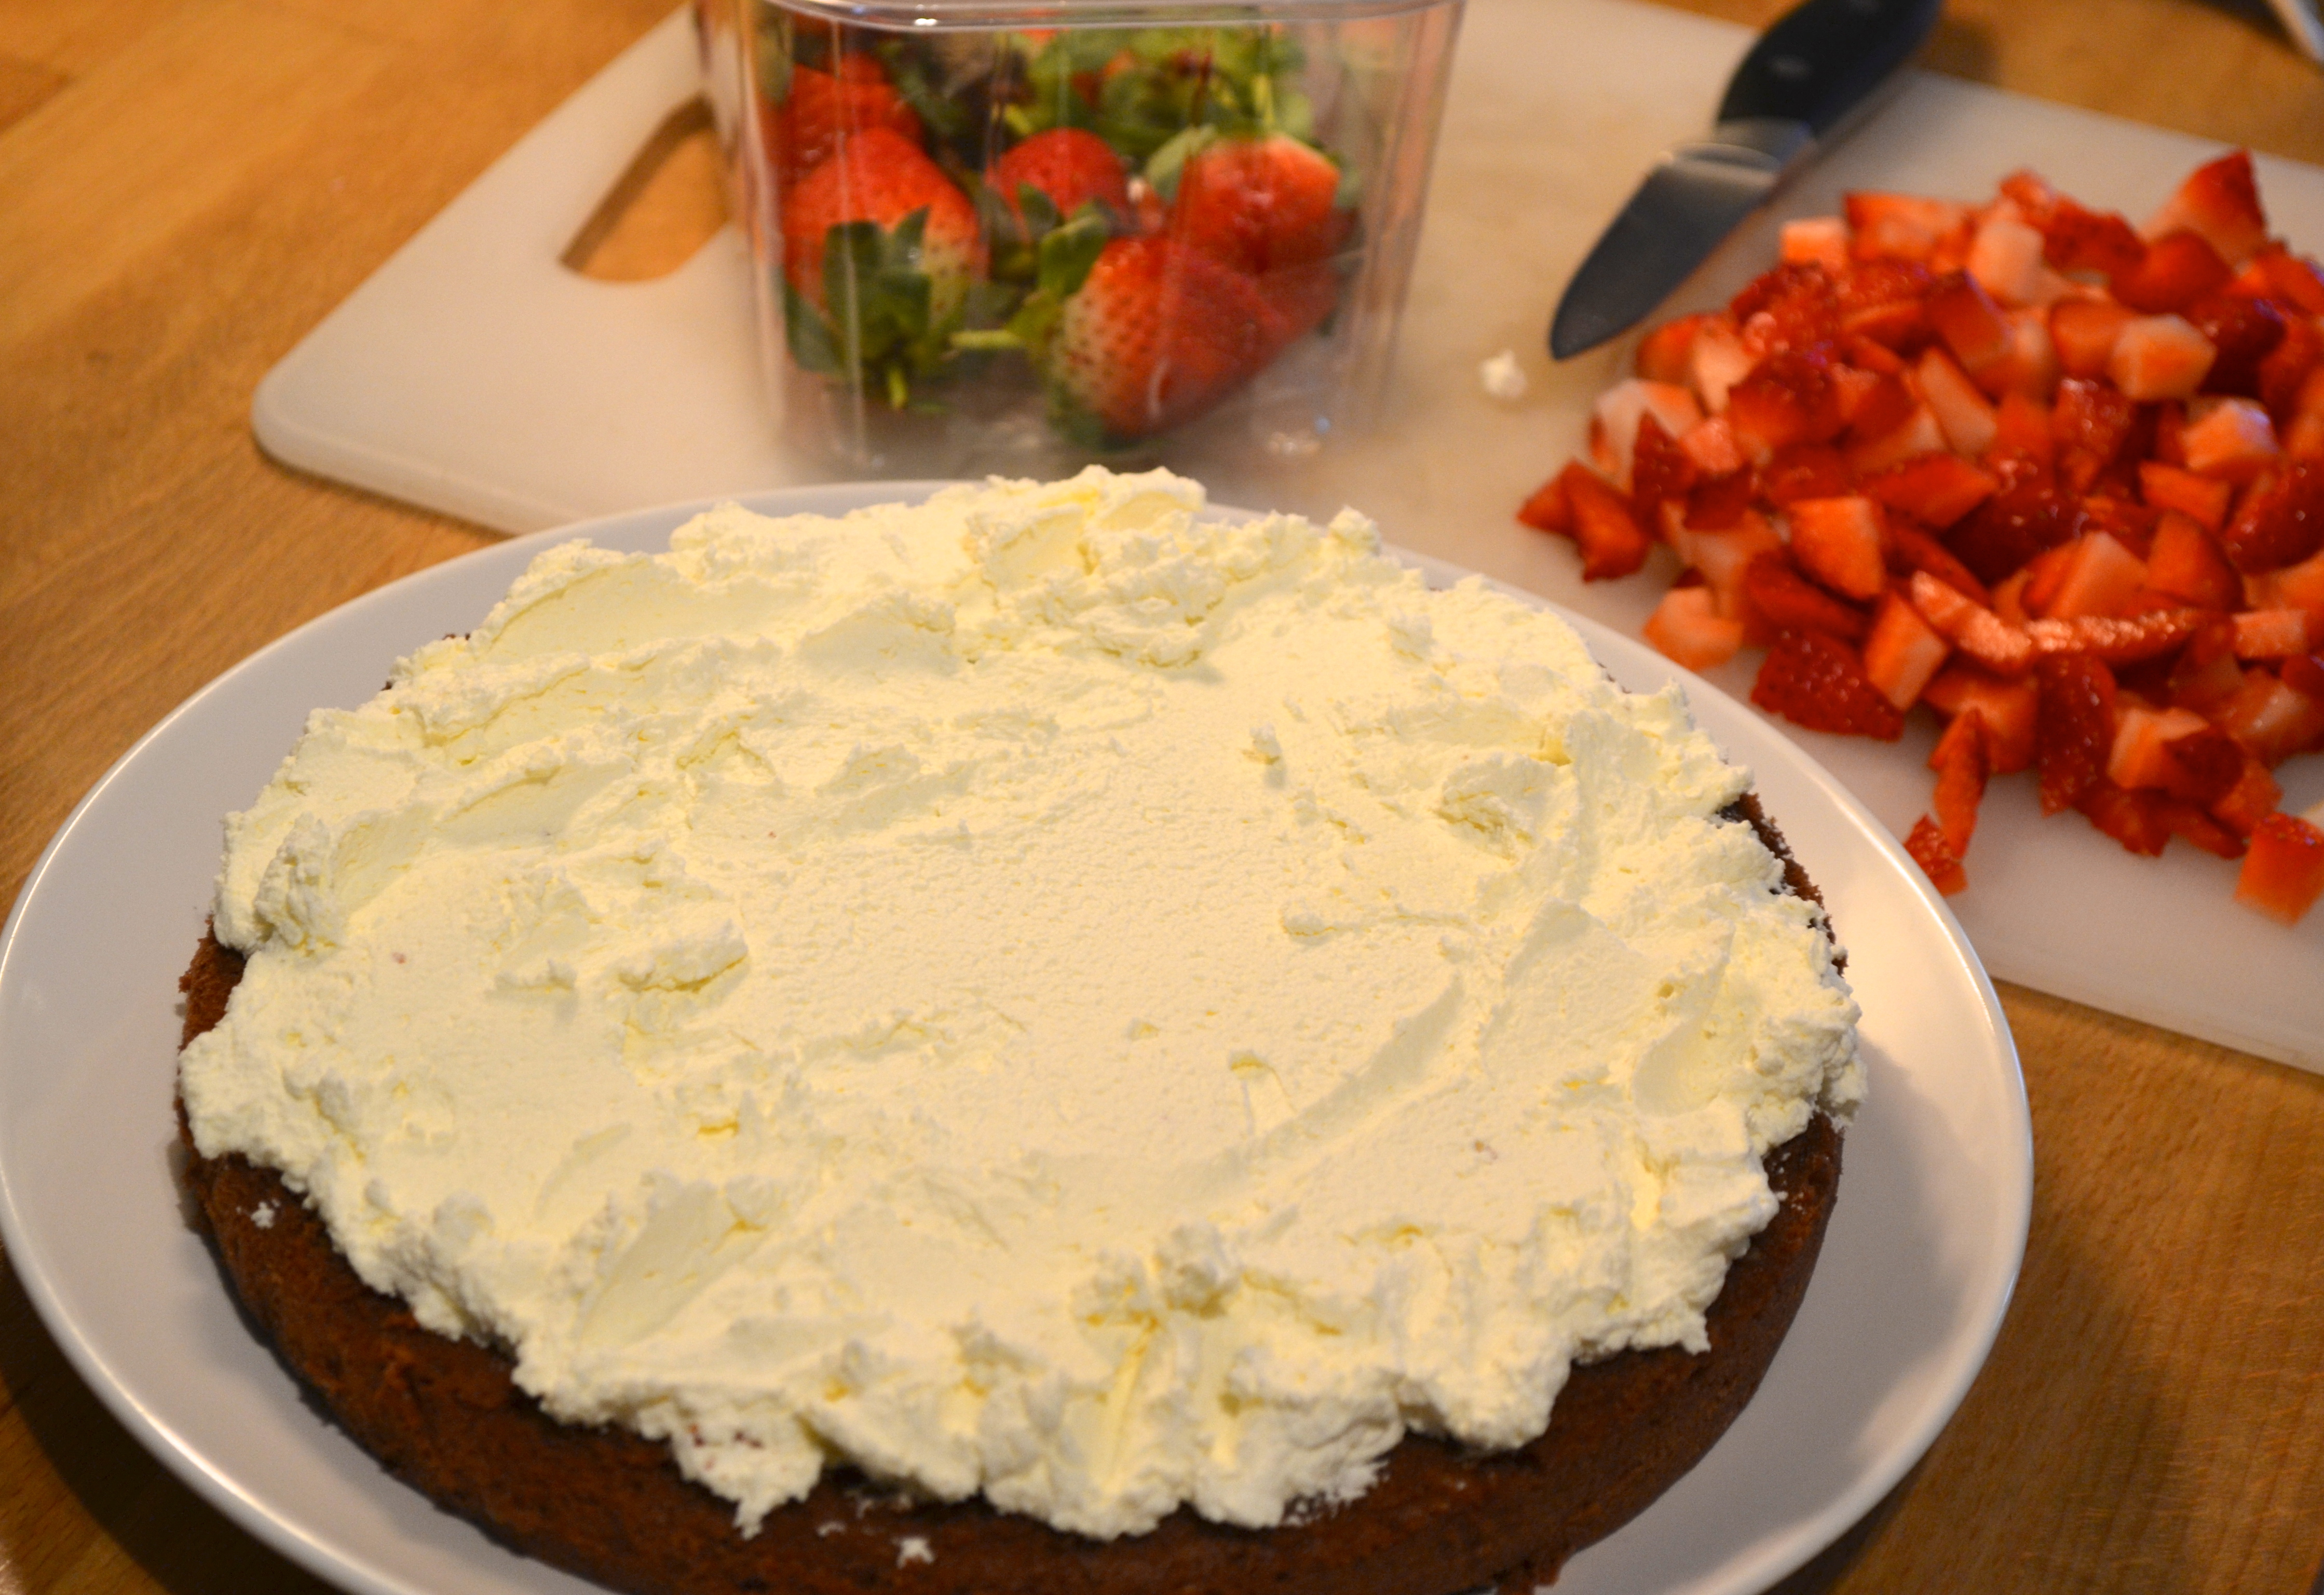 Small Chocolate Cake Recipe Jamie Oliver: Chocolate Strawberry Cake